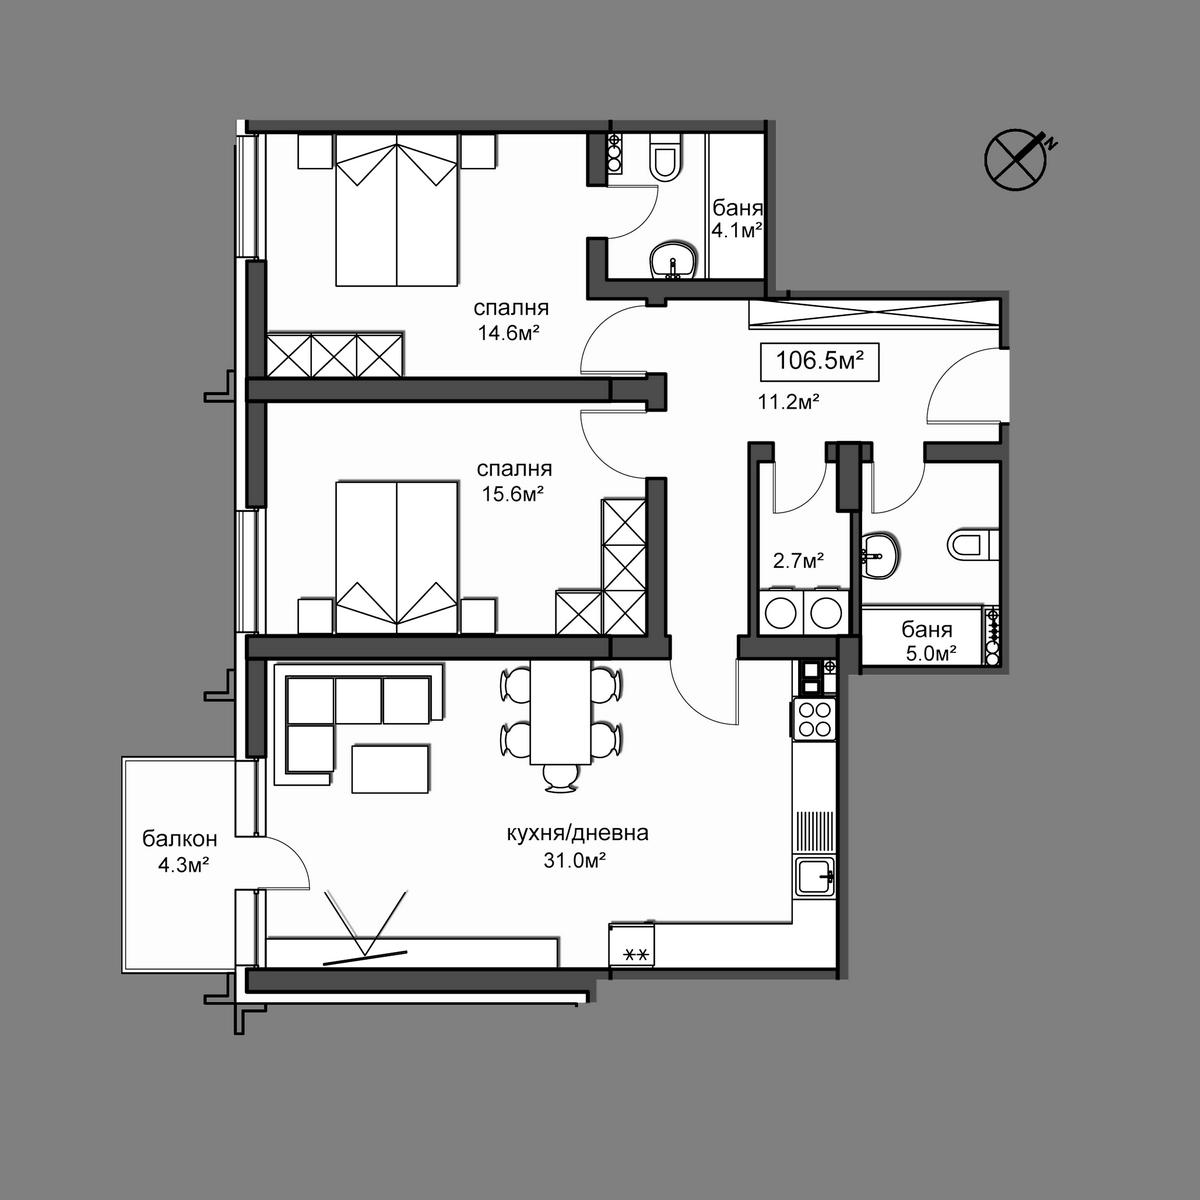 Продава апартамент ново строителство - Апартамент  33